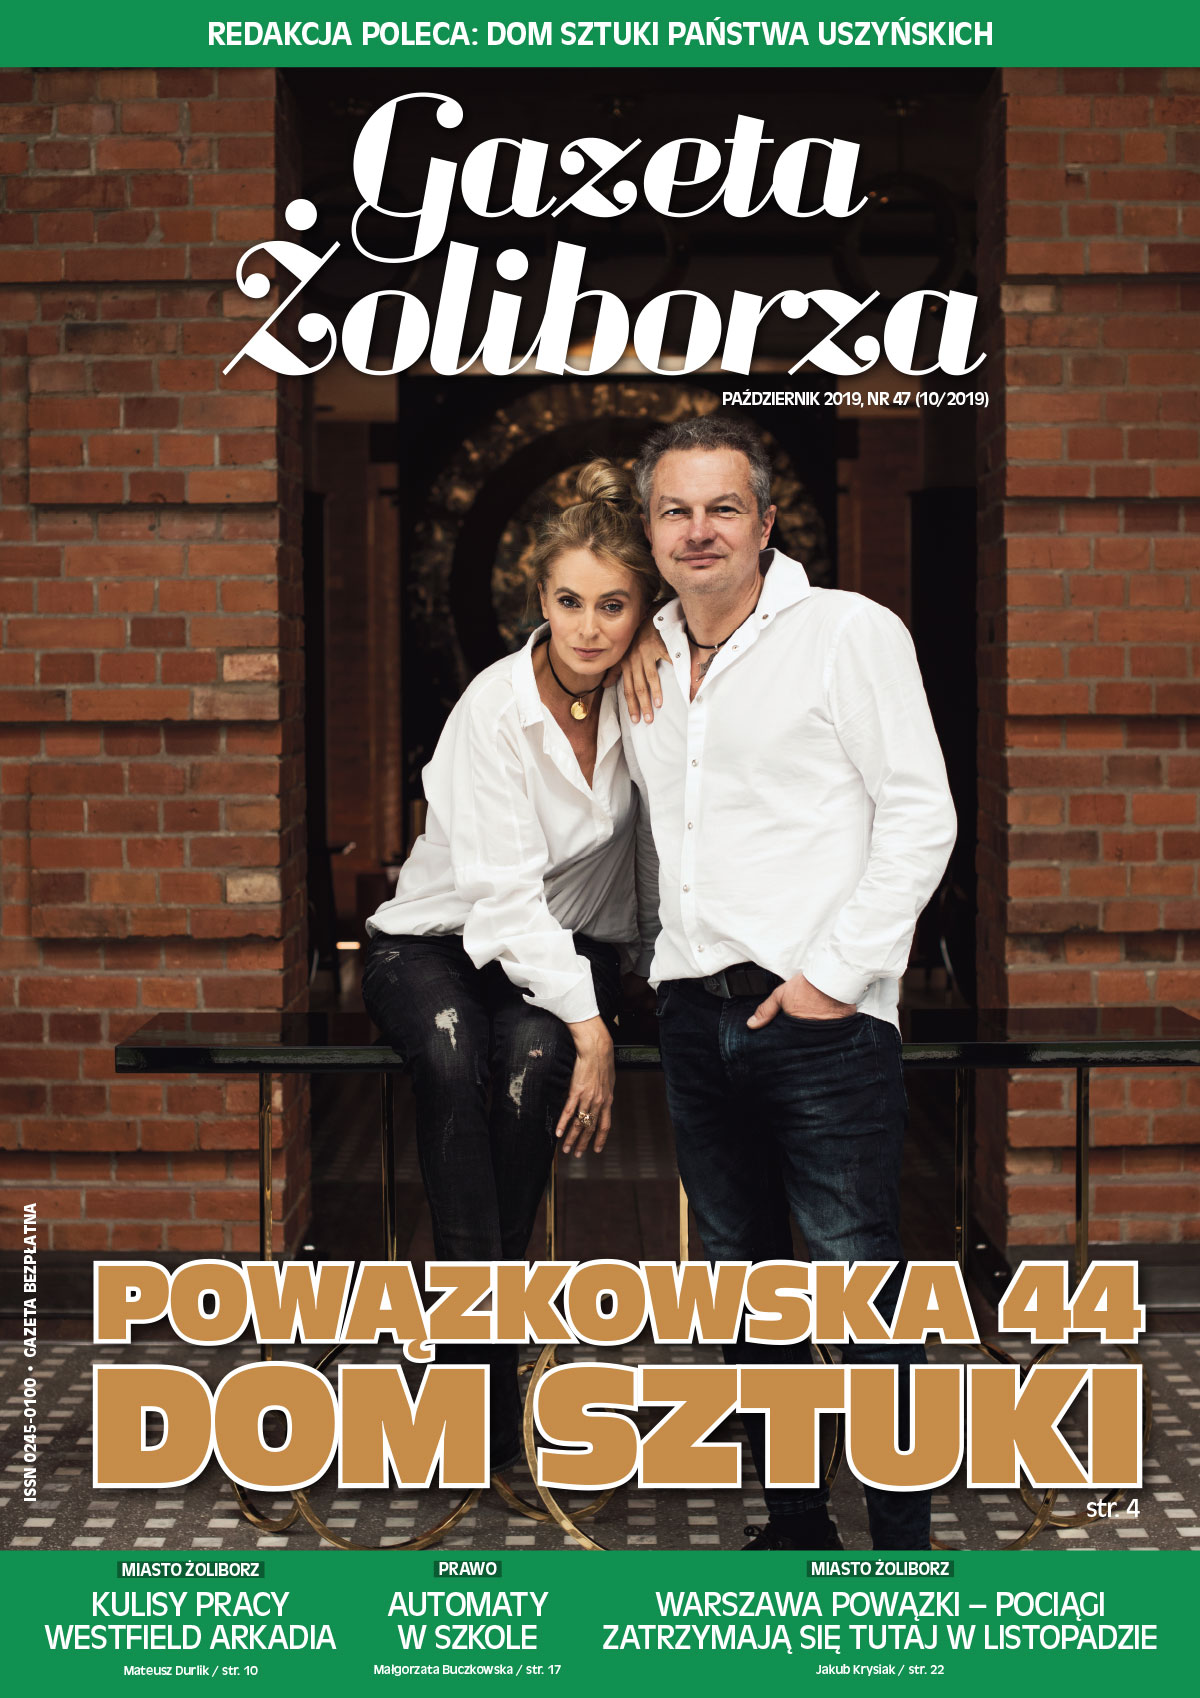 Gazeta Żoliborza - 10/2019 (47)